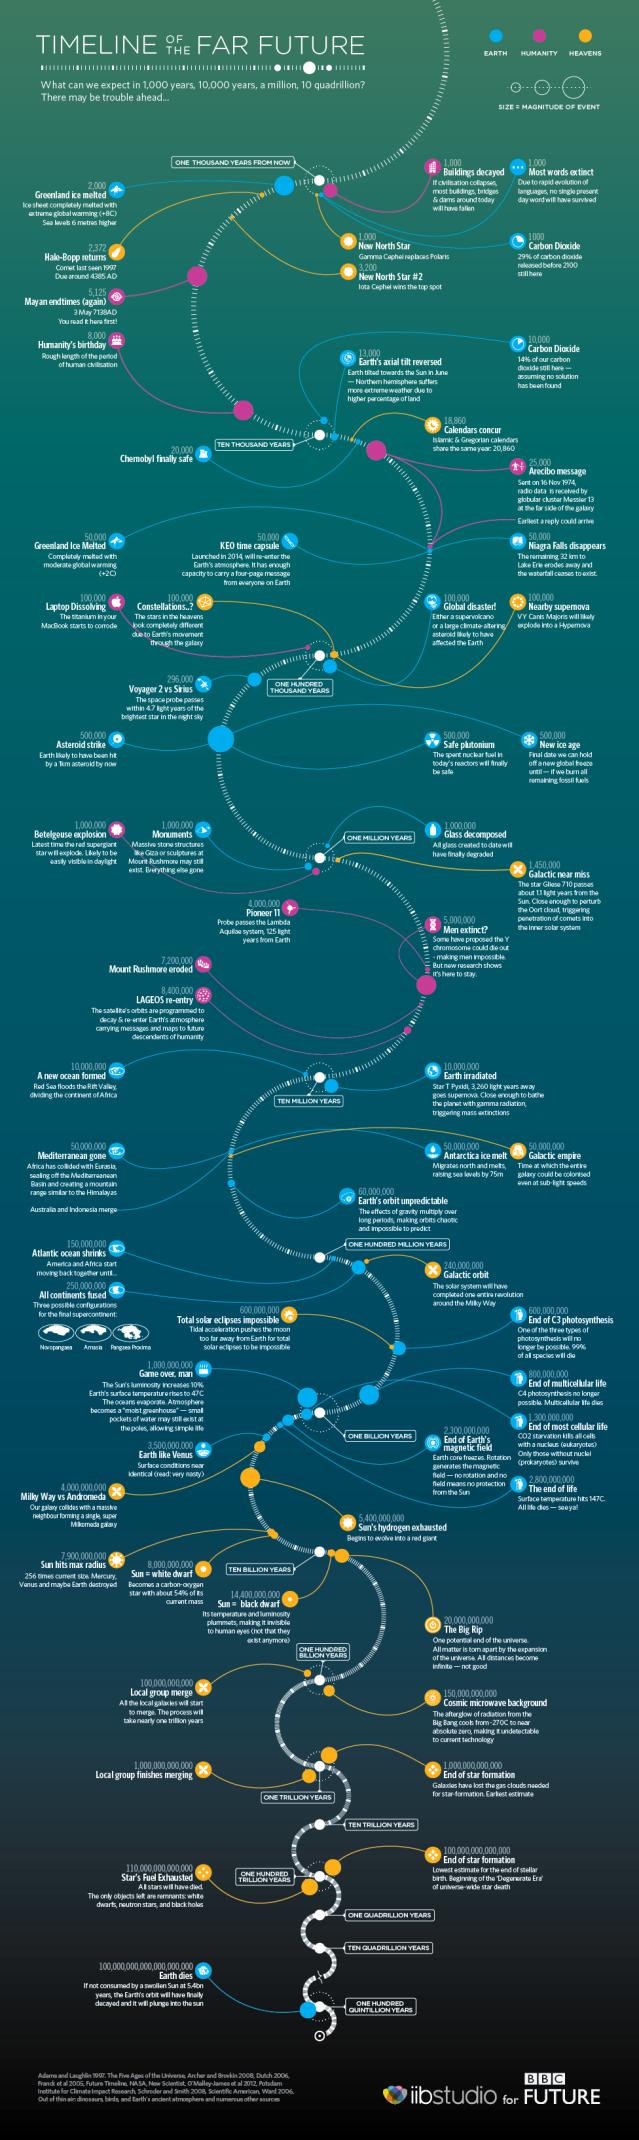 far-future-timeline-v2